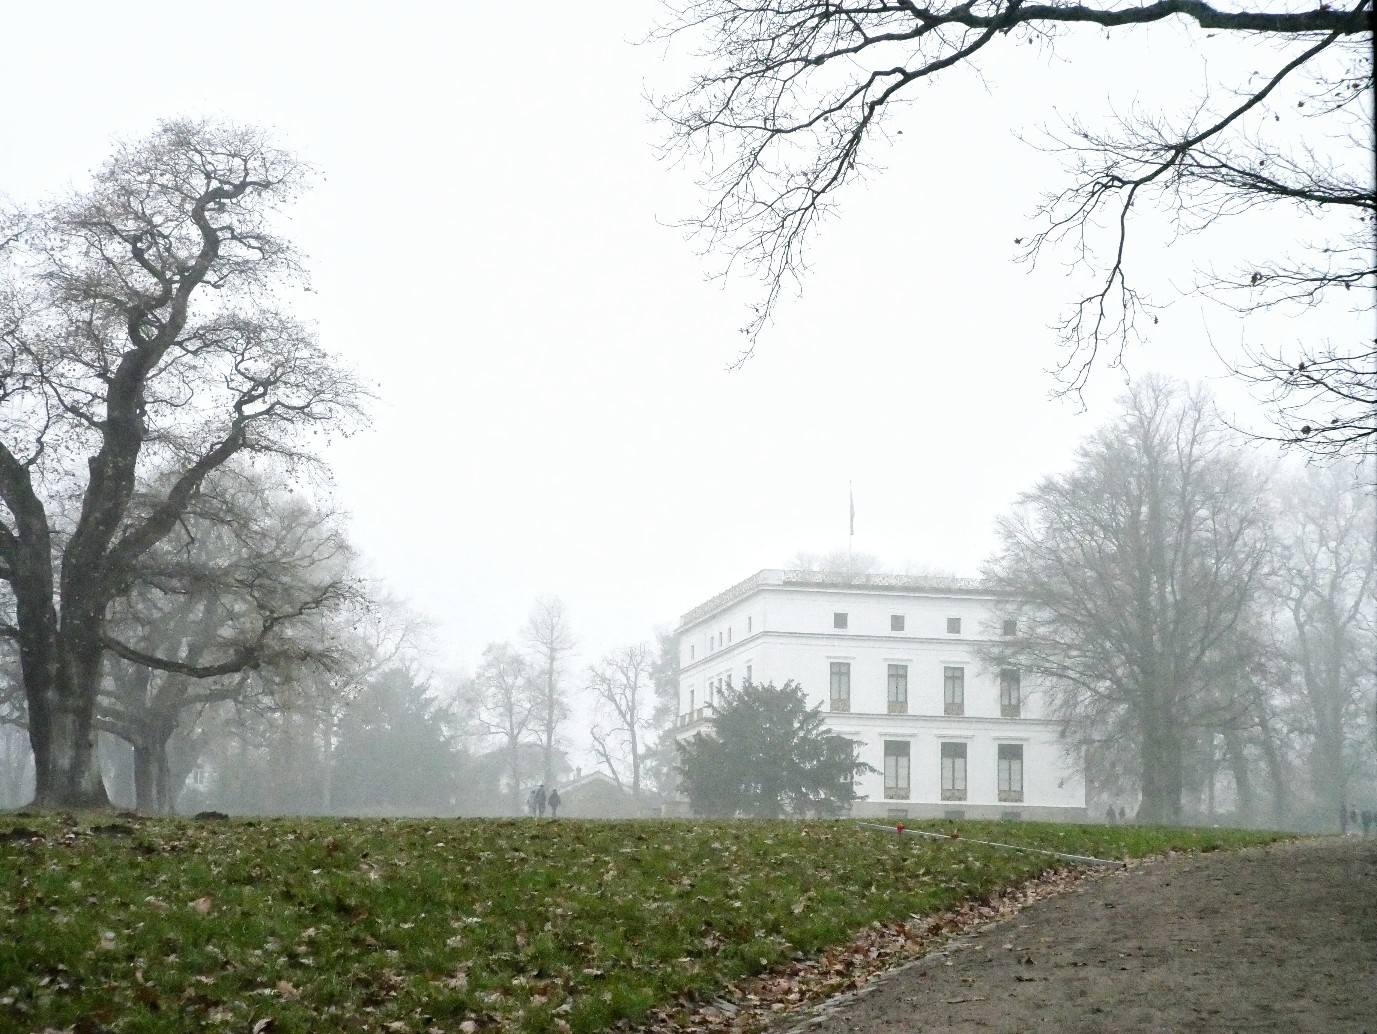 Nebel Jenischpark